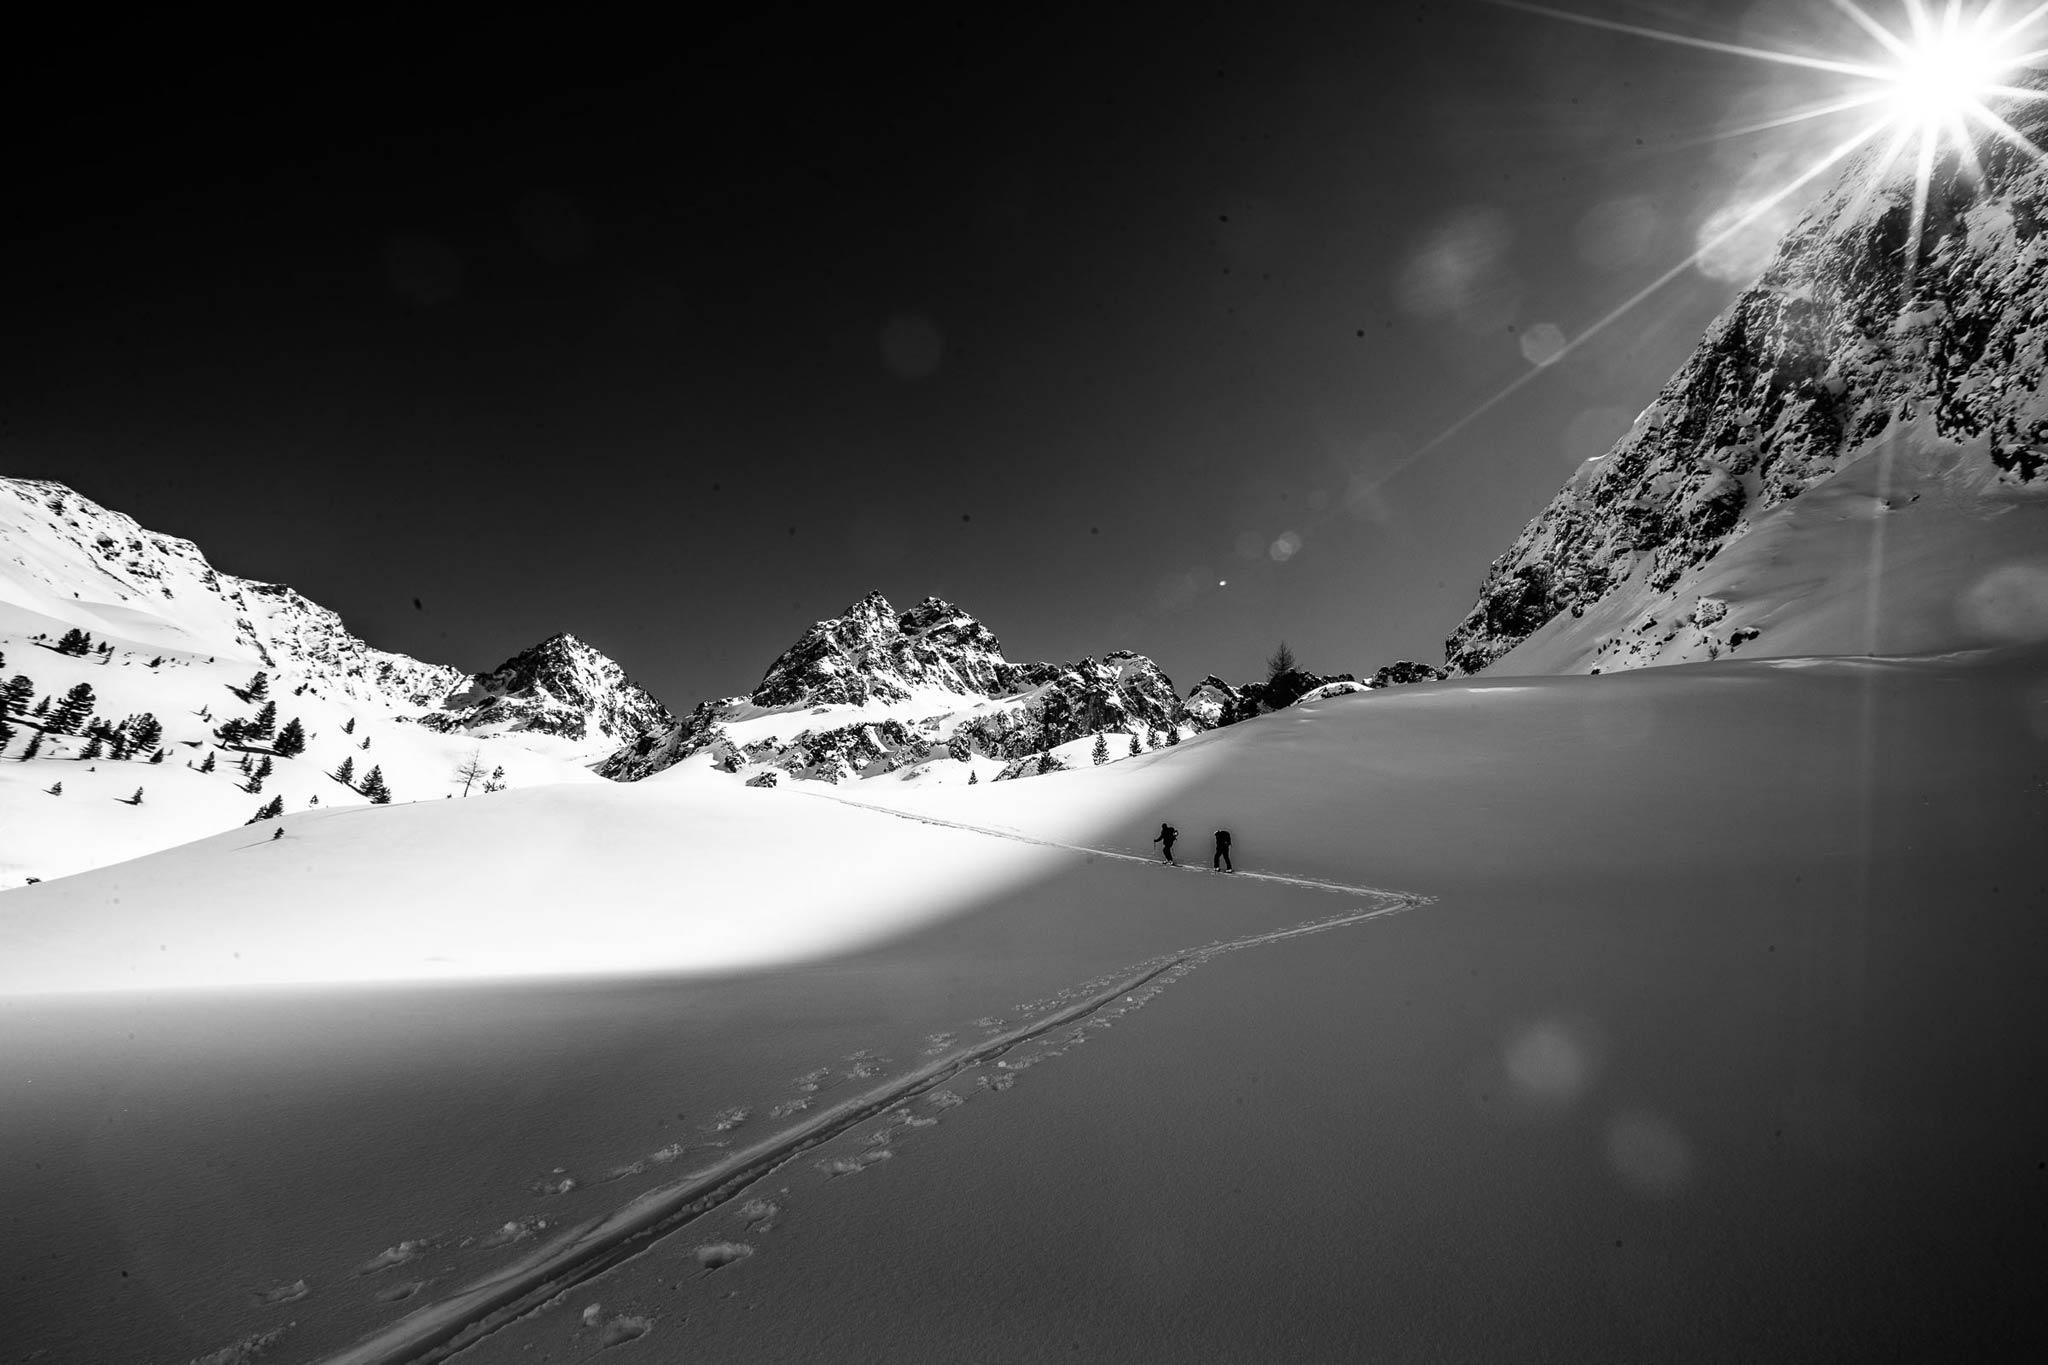 Earn your turns - Foto: Flo Breitenberger